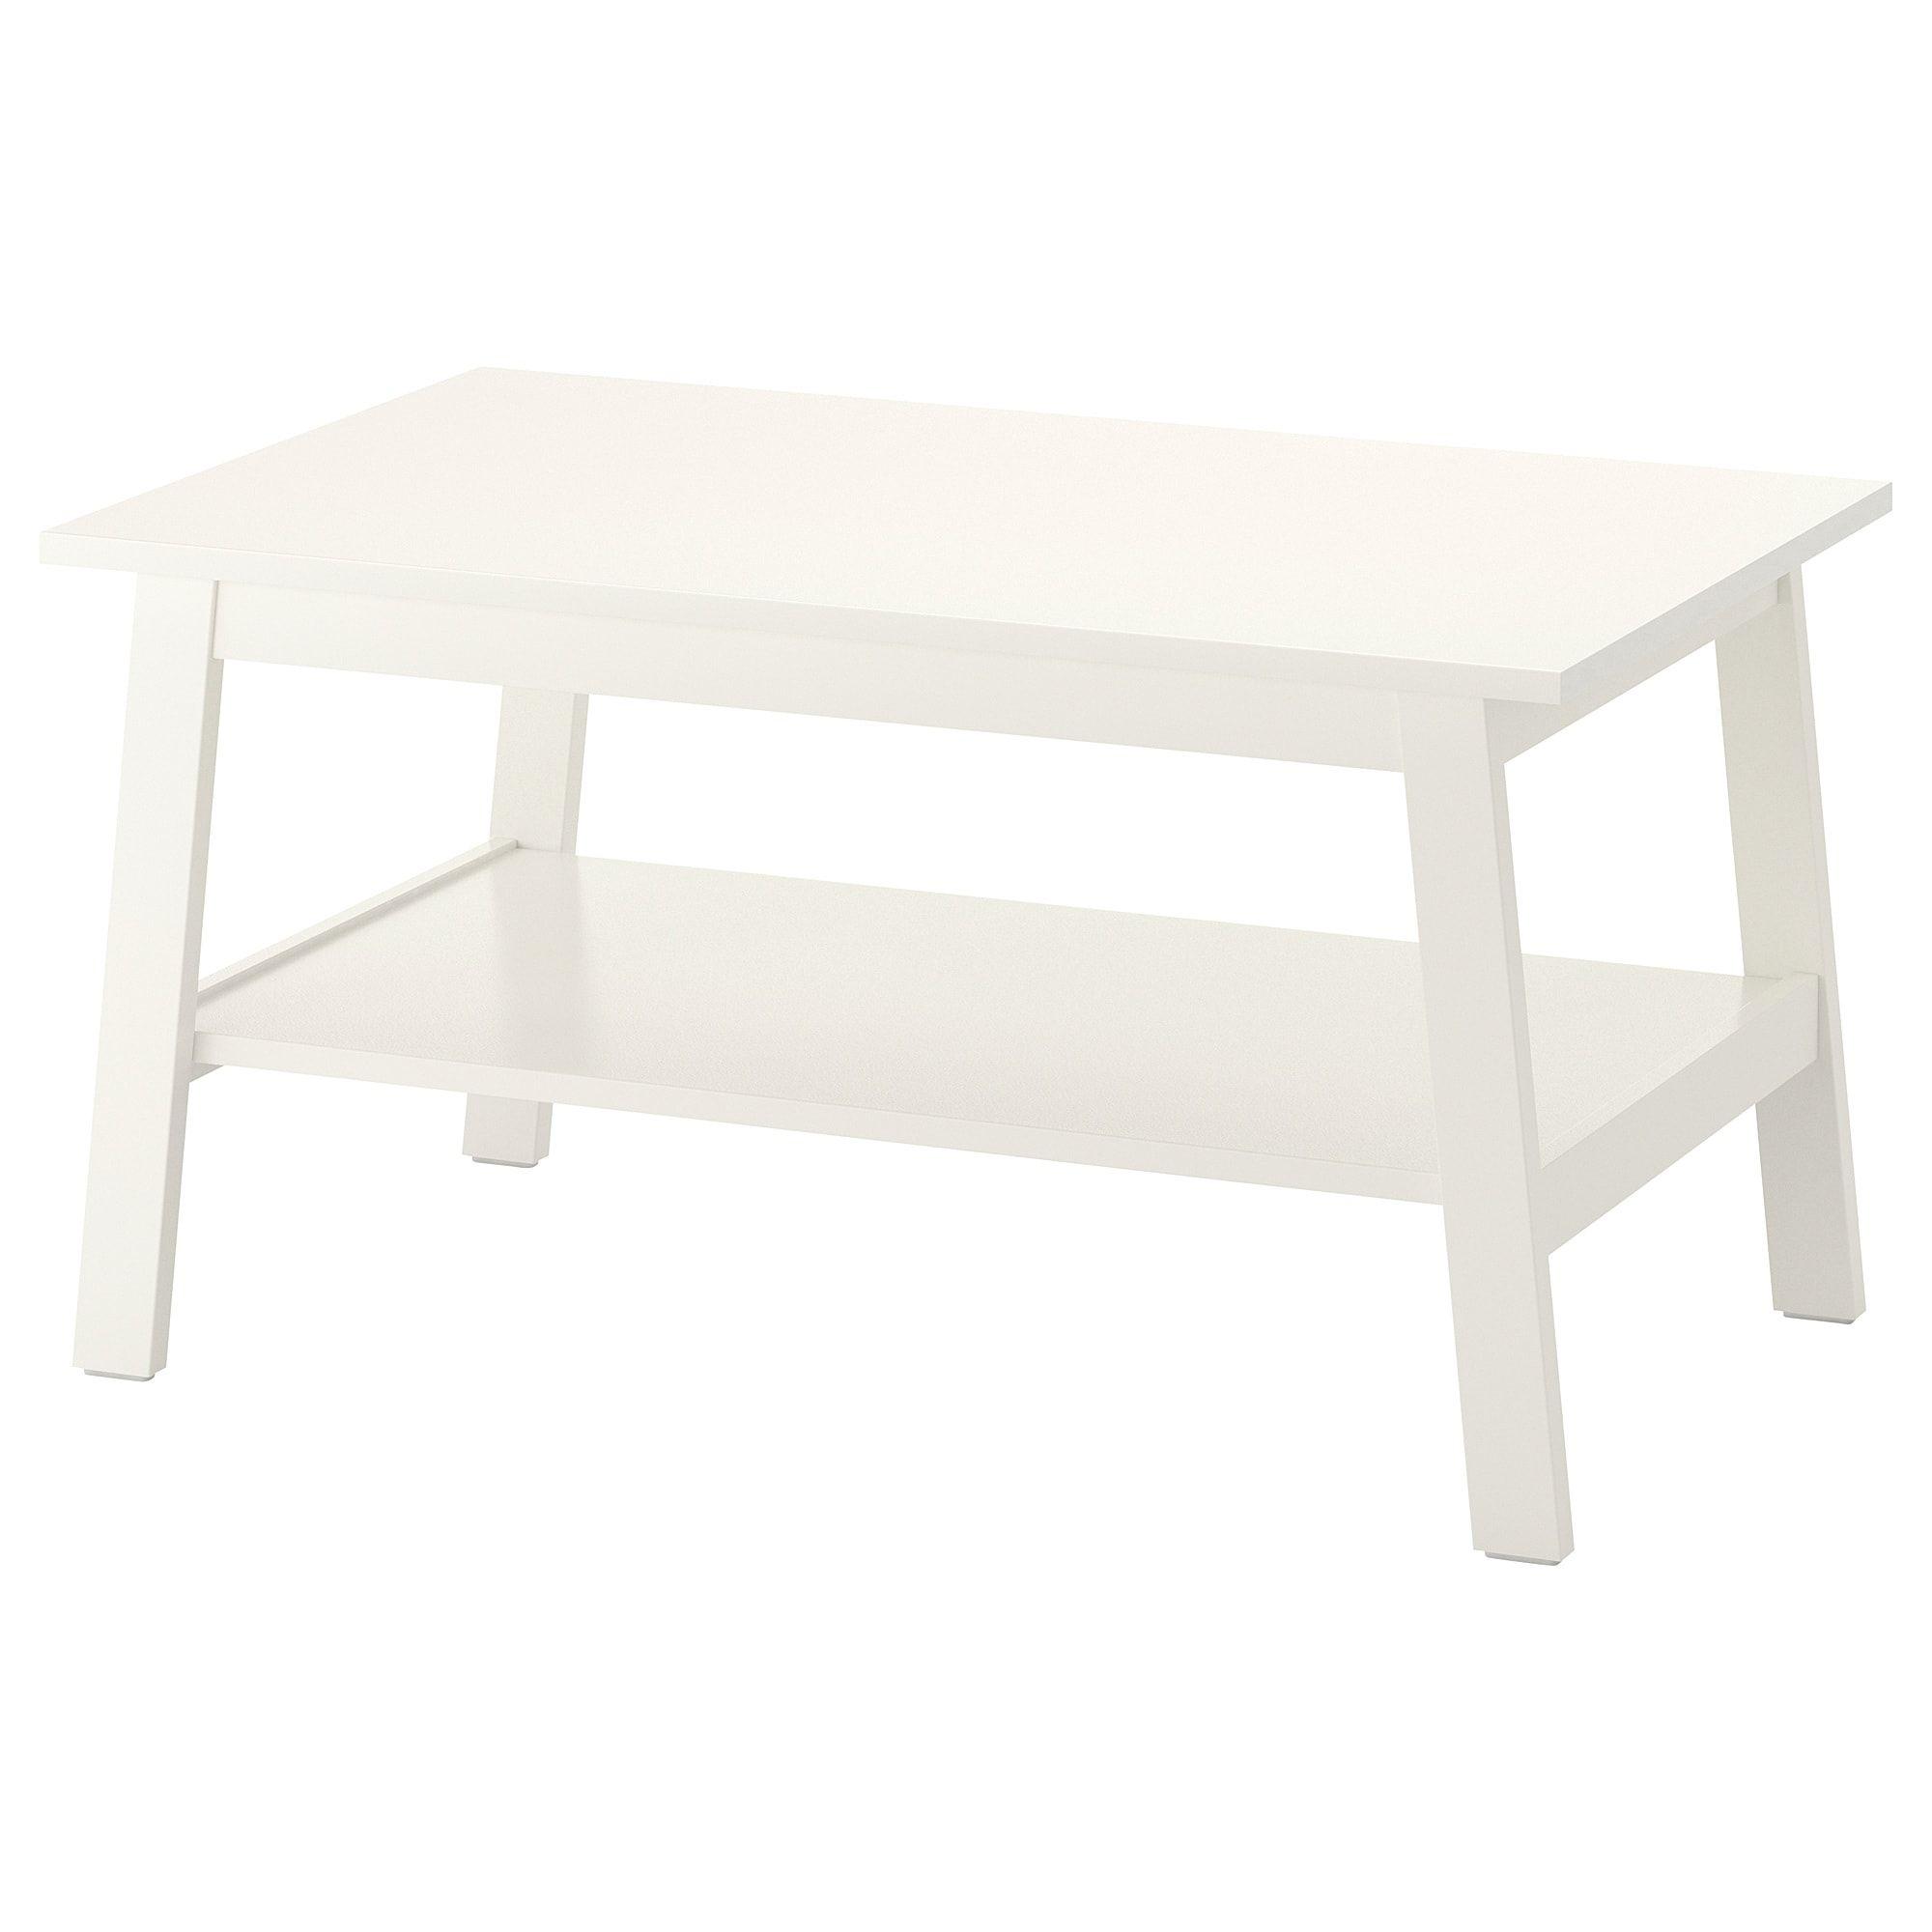 Lunnarp Table Basse Blanc 90x55 Cm Ikea Coffee Table White Coffee Table Ikea Side Table [ 2000 x 2000 Pixel ]